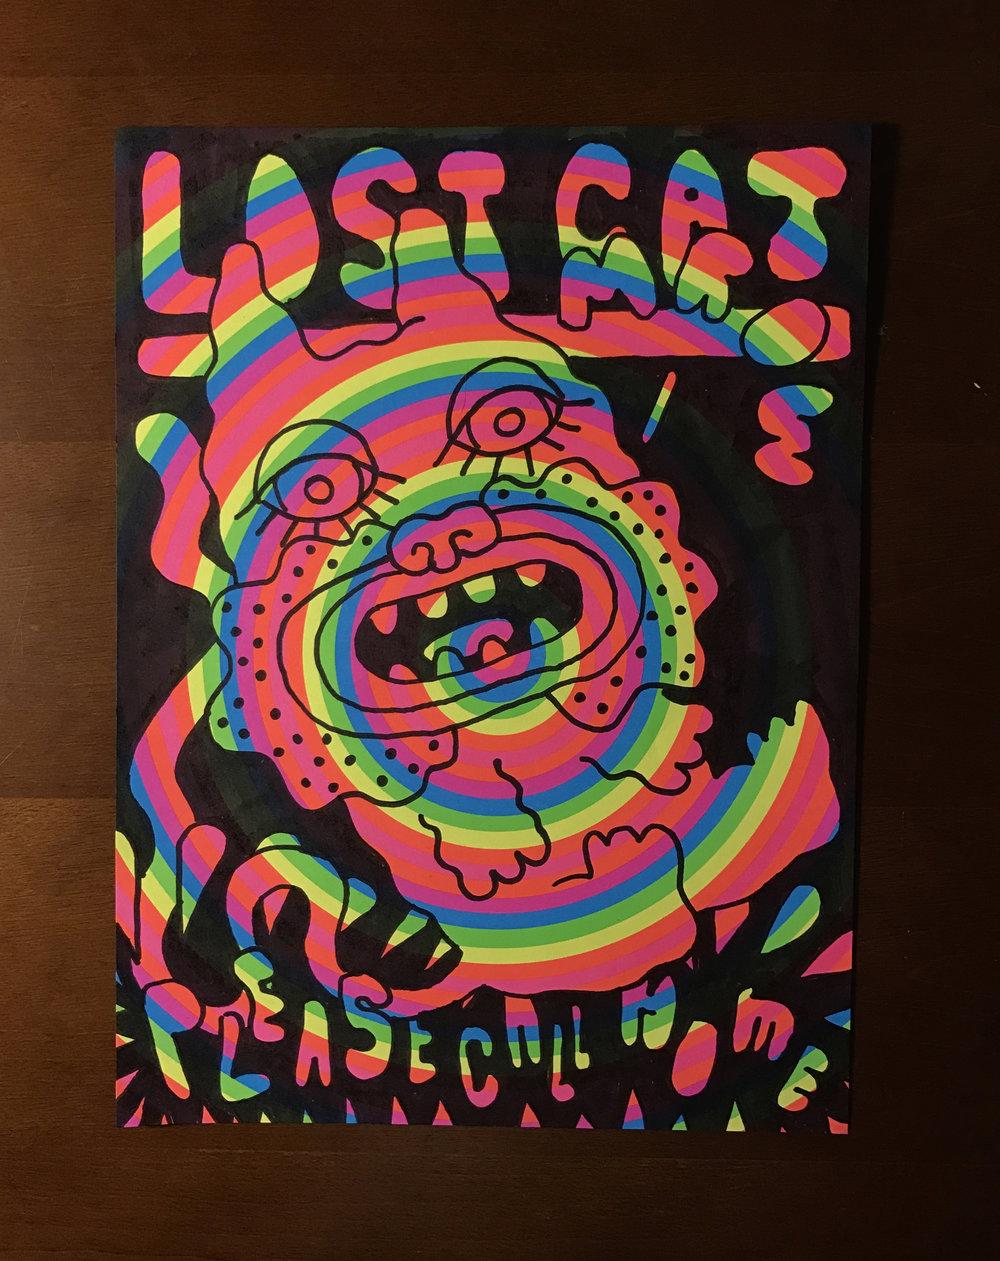 Jarad-Solomon-Lost-Cat-rainbow-3.jpg